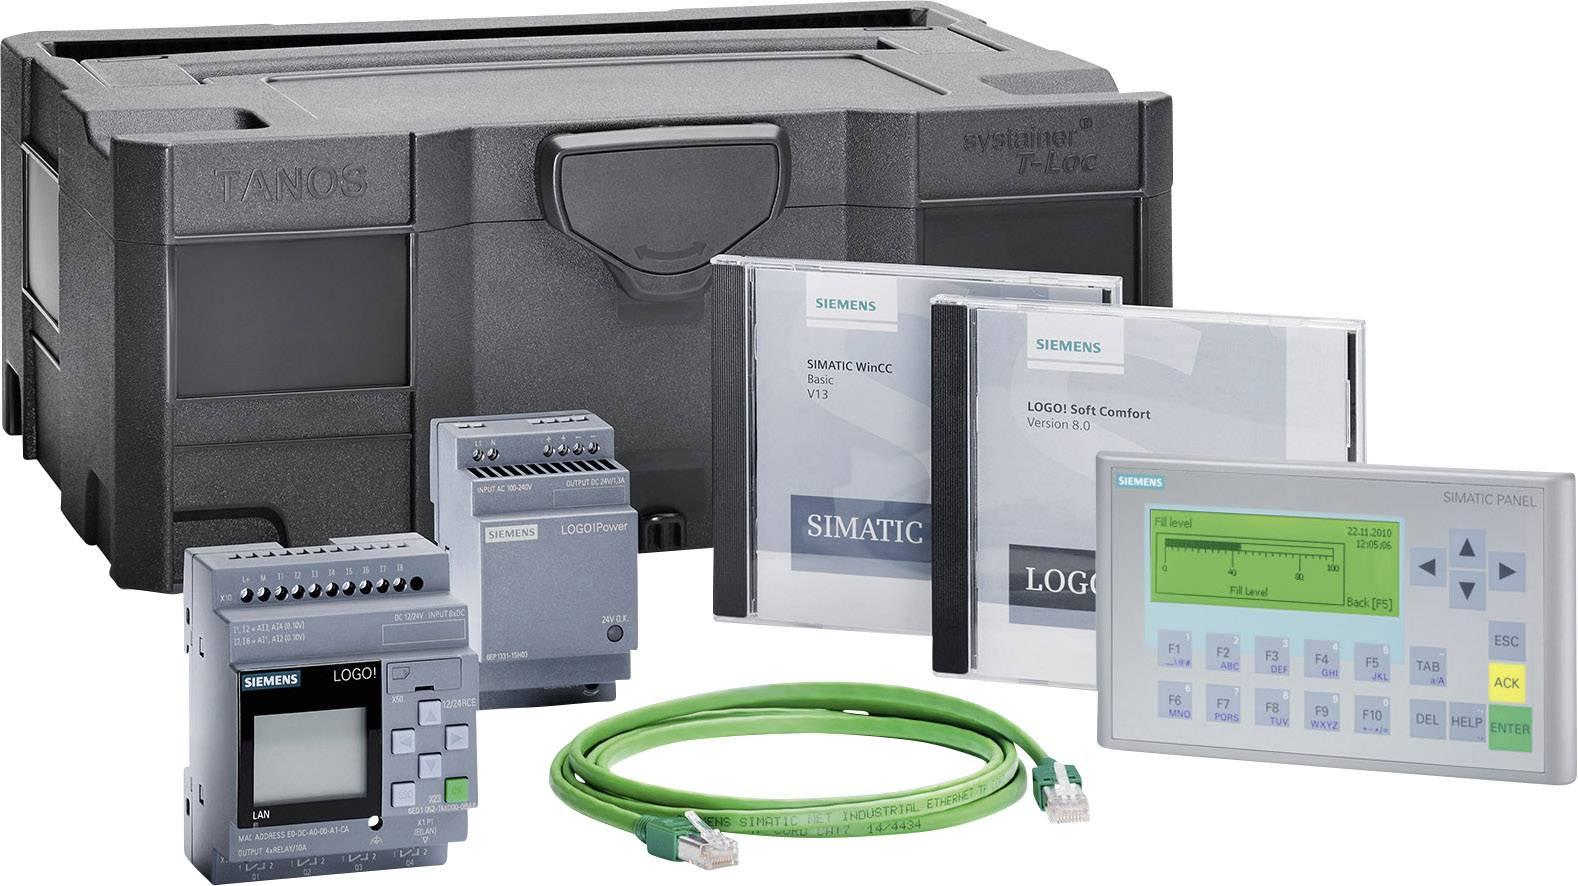 Štartovacia súprava Siemens LOGO! KP300 BASIC STARTER LOGO! 12/24RCE 6AV2132-0HA00-0AA1